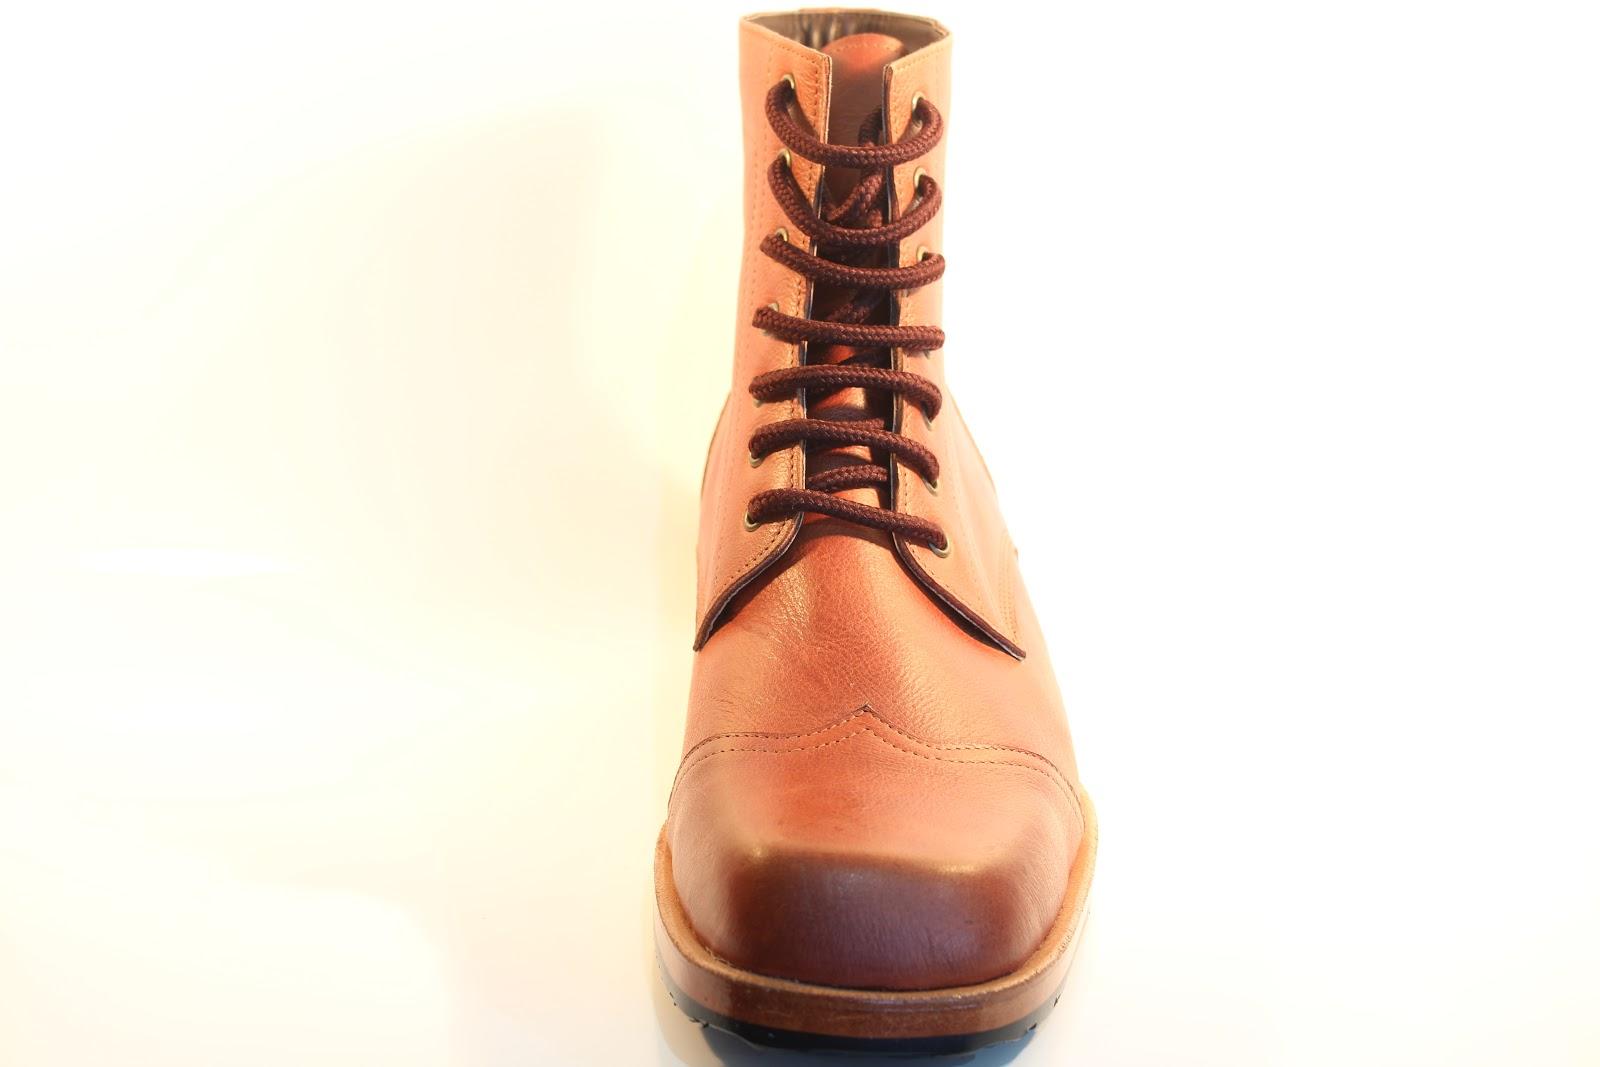 Midsole Tech Boot 1 Elevator Shoes